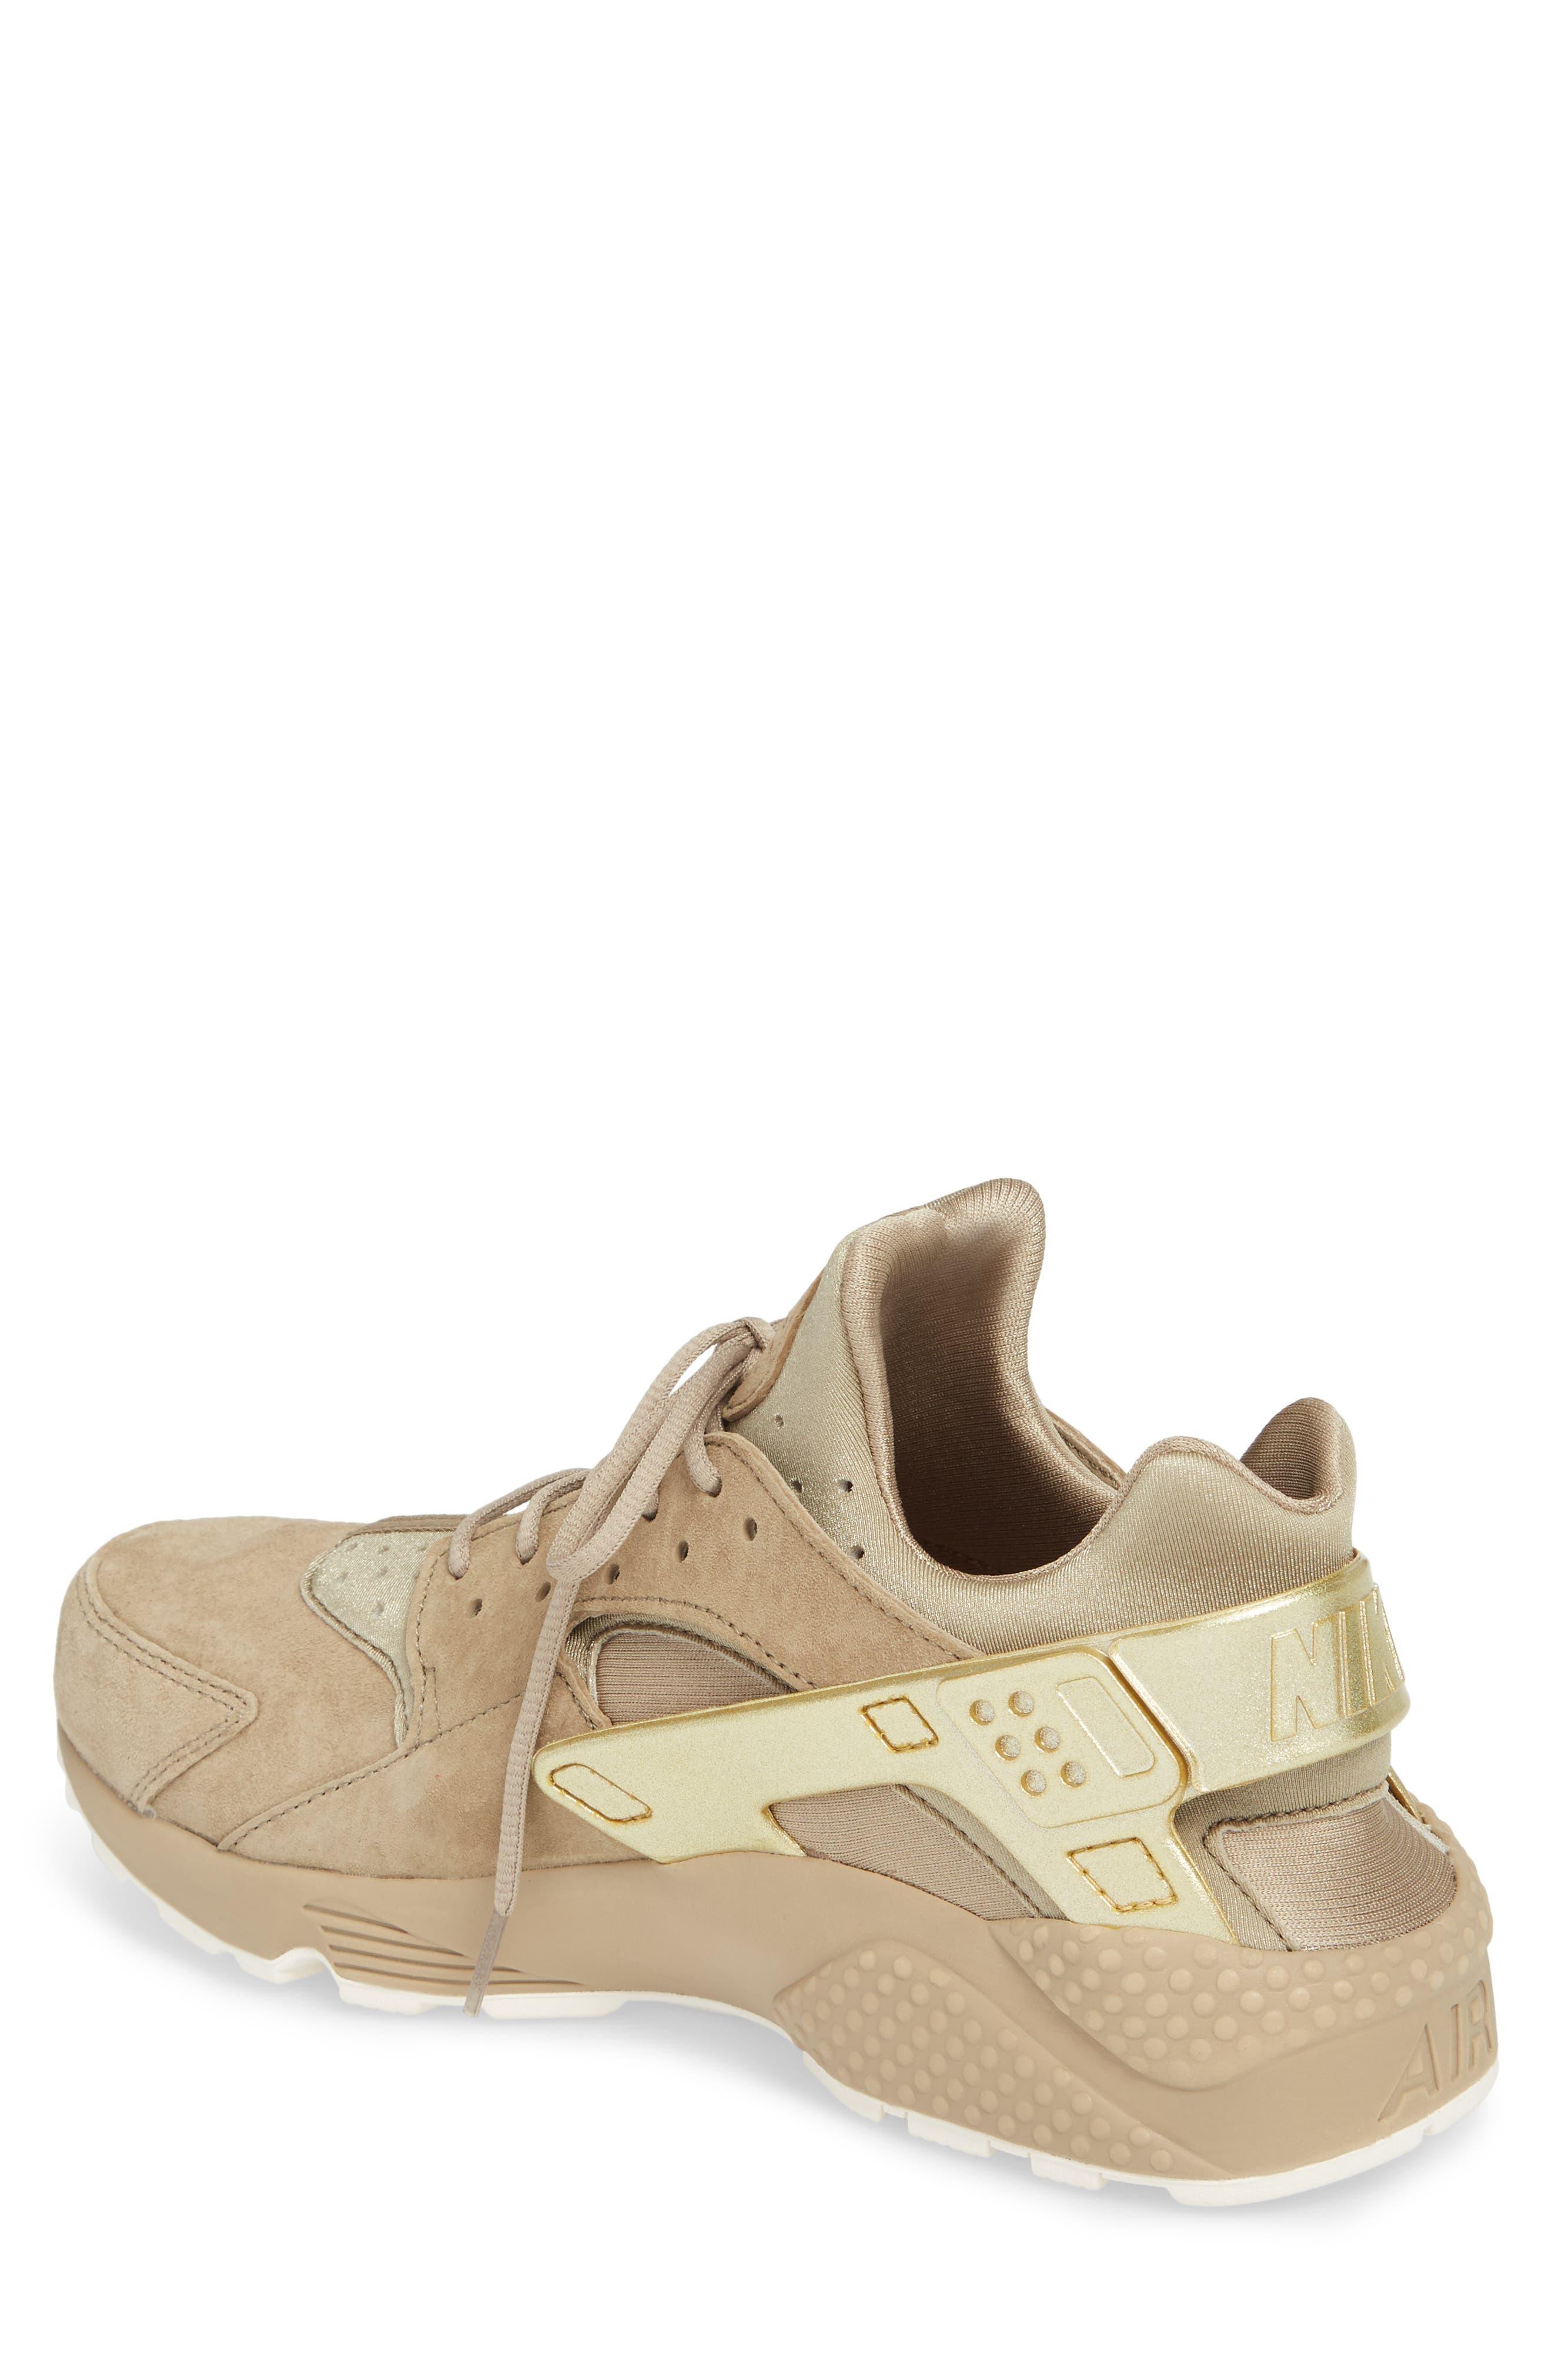 'Air Huarache Premiere' Sneaker,                             Alternate thumbnail 2, color,                             Khaki/ Gold/ Sail